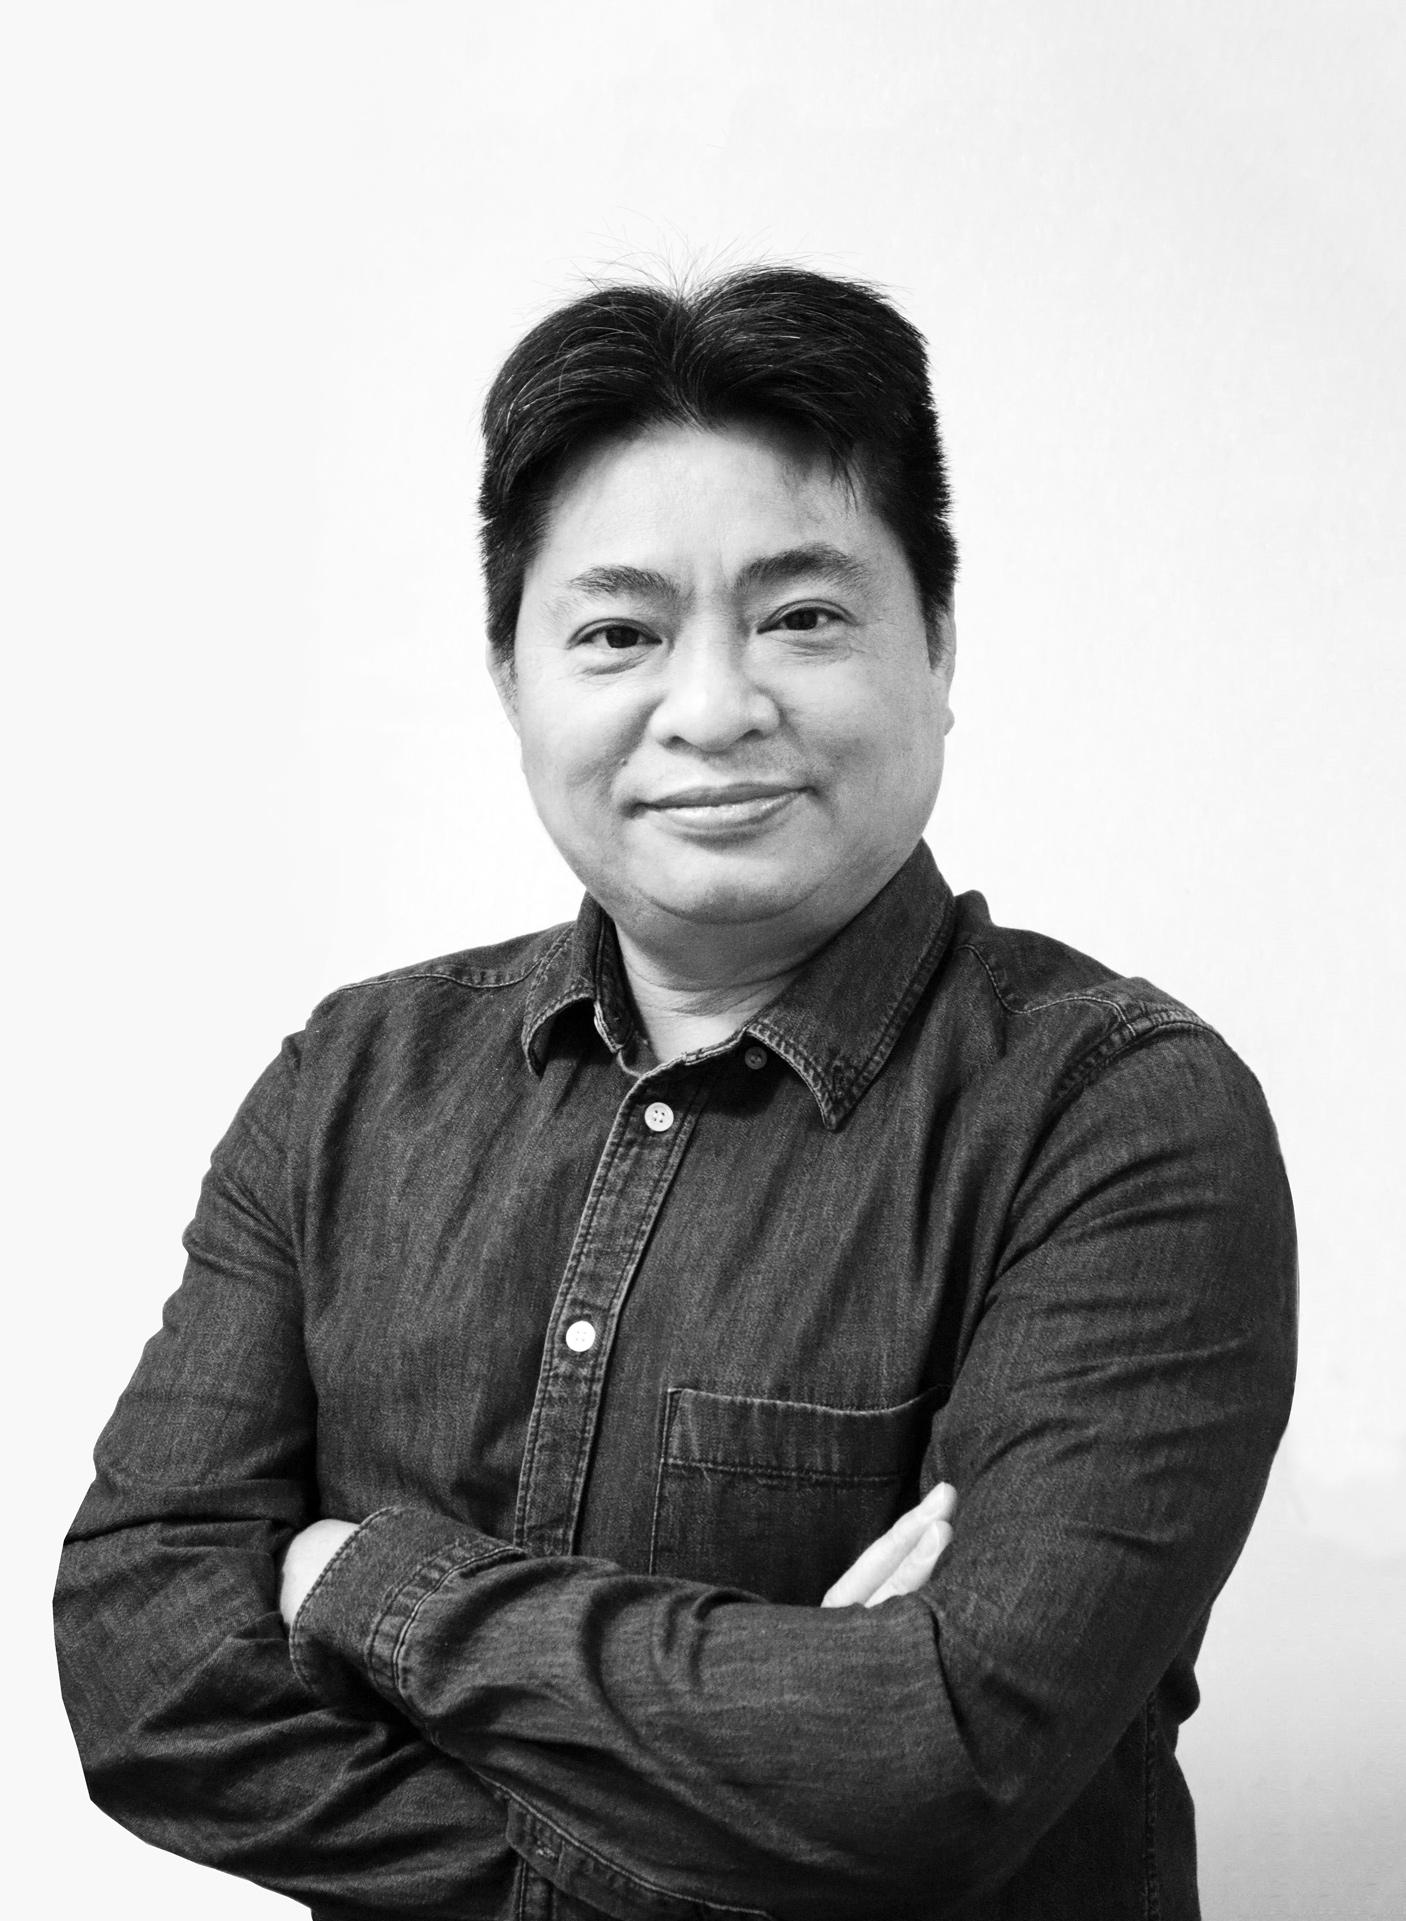 portrait of Ken Leung